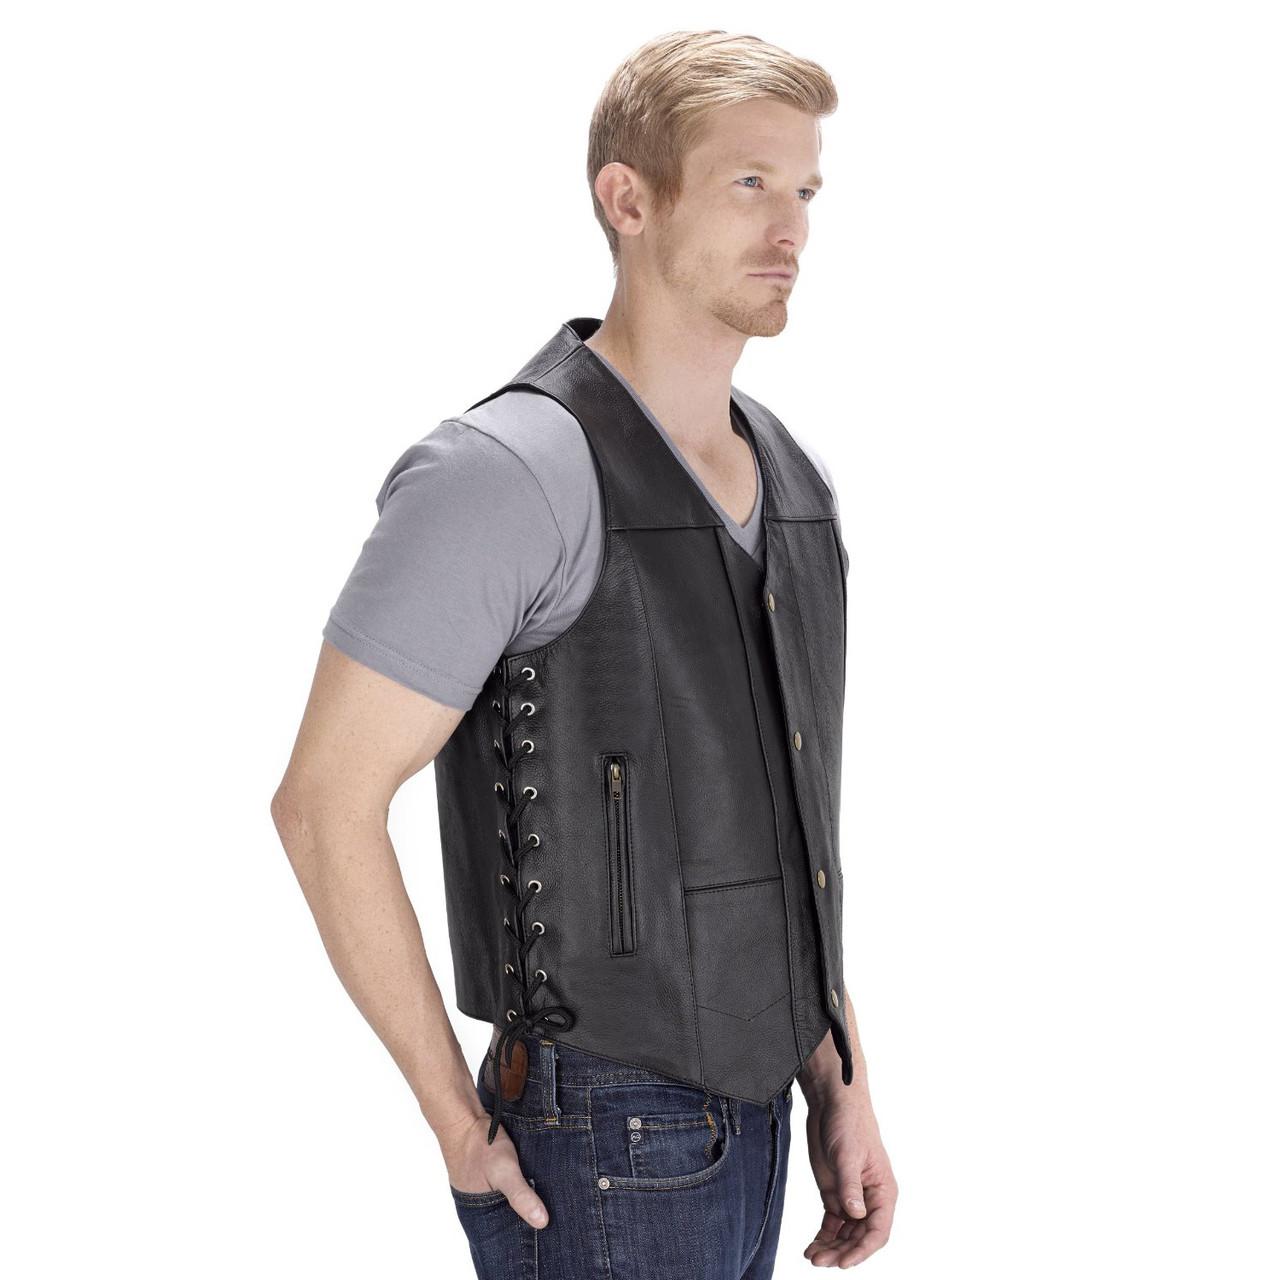 Vikingcycle Thorfinn 10 Pocket Motorcycle Vest For Men